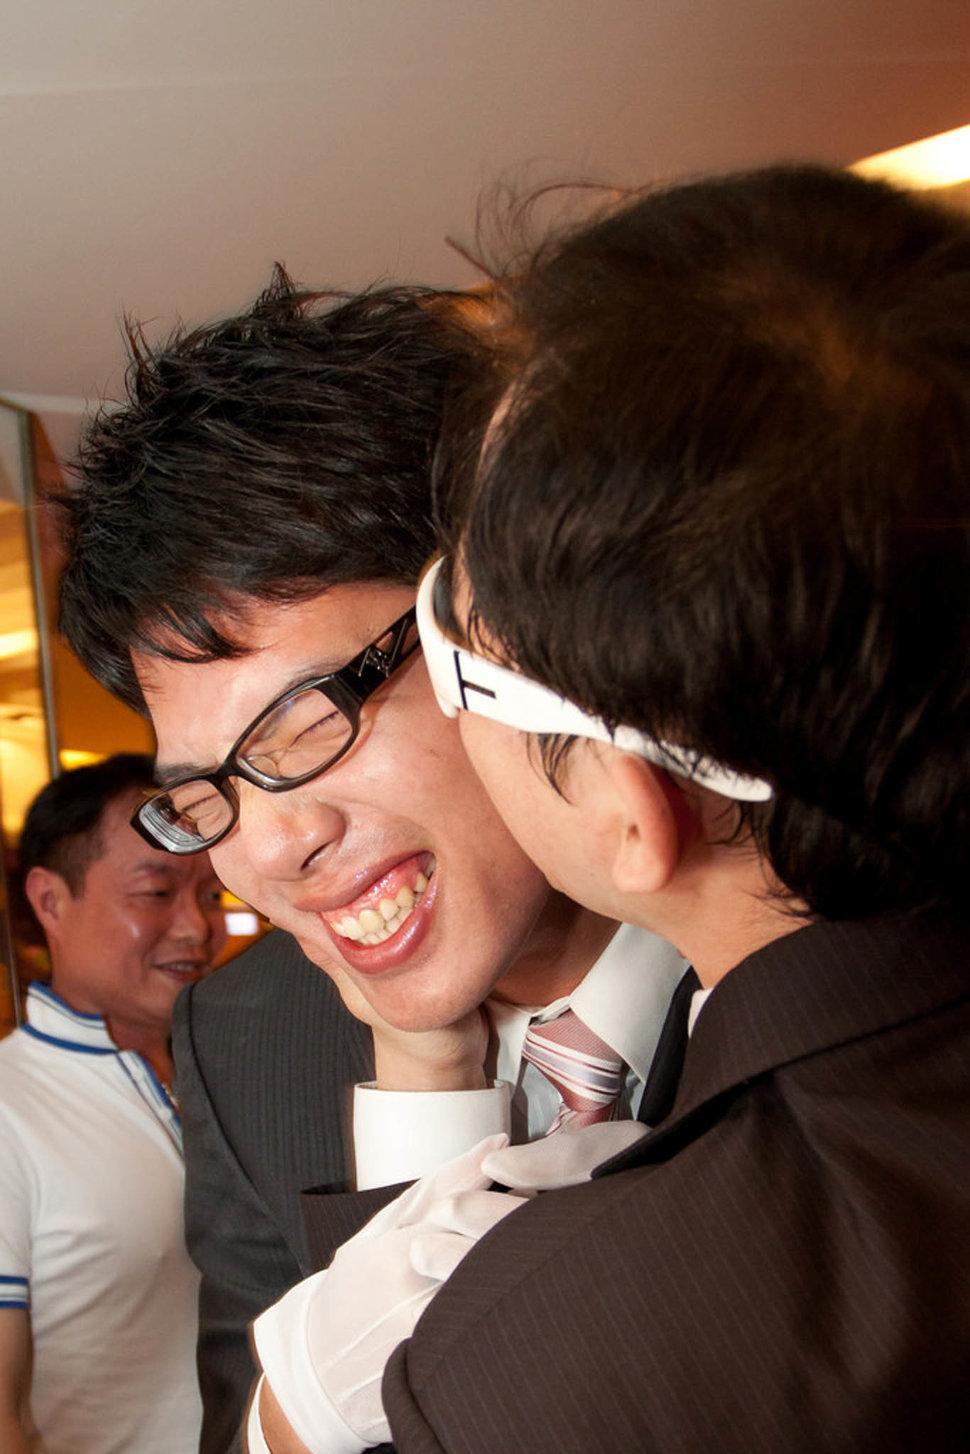 18PHOTO-佳成❤️ 玨萍(編號:220195) - 18PHOTO 婚紗影像攝影工作室 - 結婚吧一站式婚禮服務平台